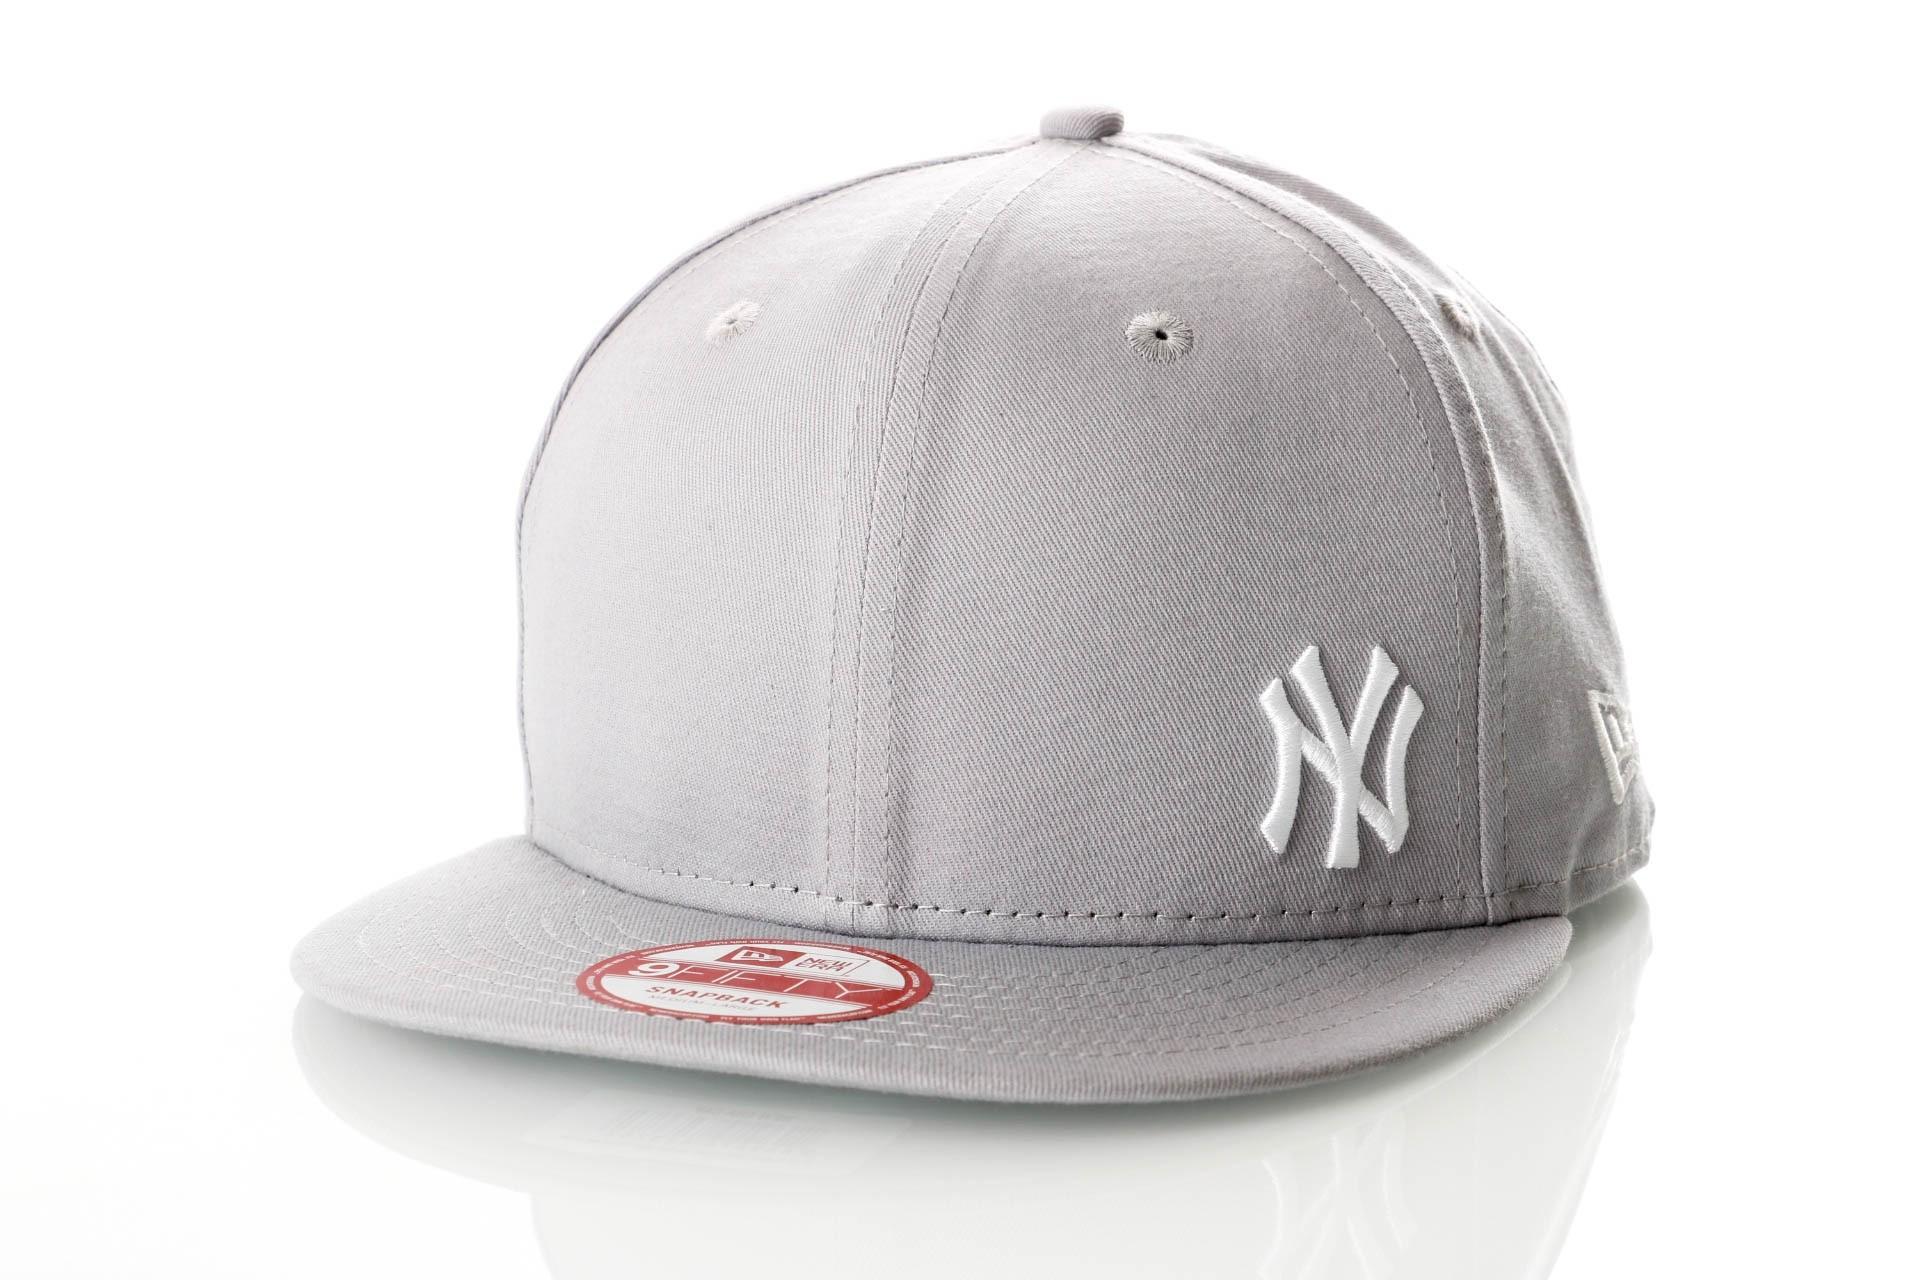 Afbeelding van New Era MLB FLAWLESS LOGO BASIC 950 NE11209934 Snapback cap GRA MLB